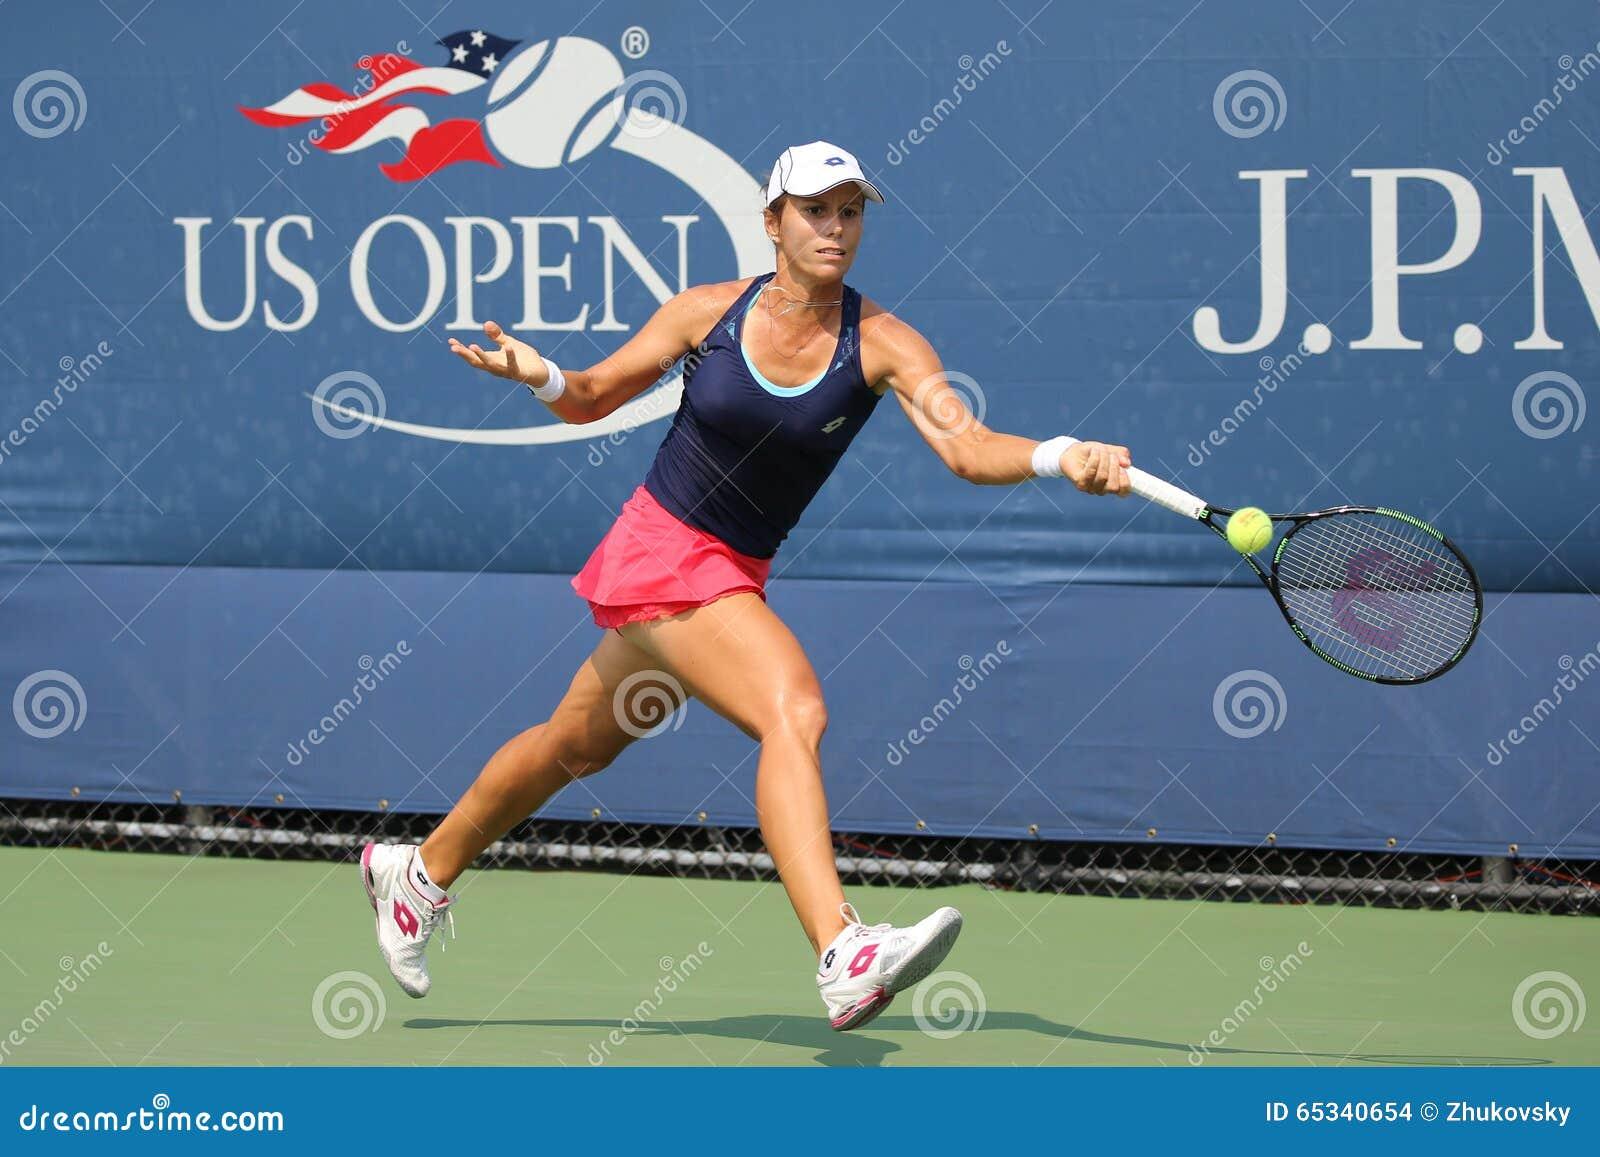 Professional Tennis Player Varvara Lepchenko Of United ...Varvara Lepchenko Matches